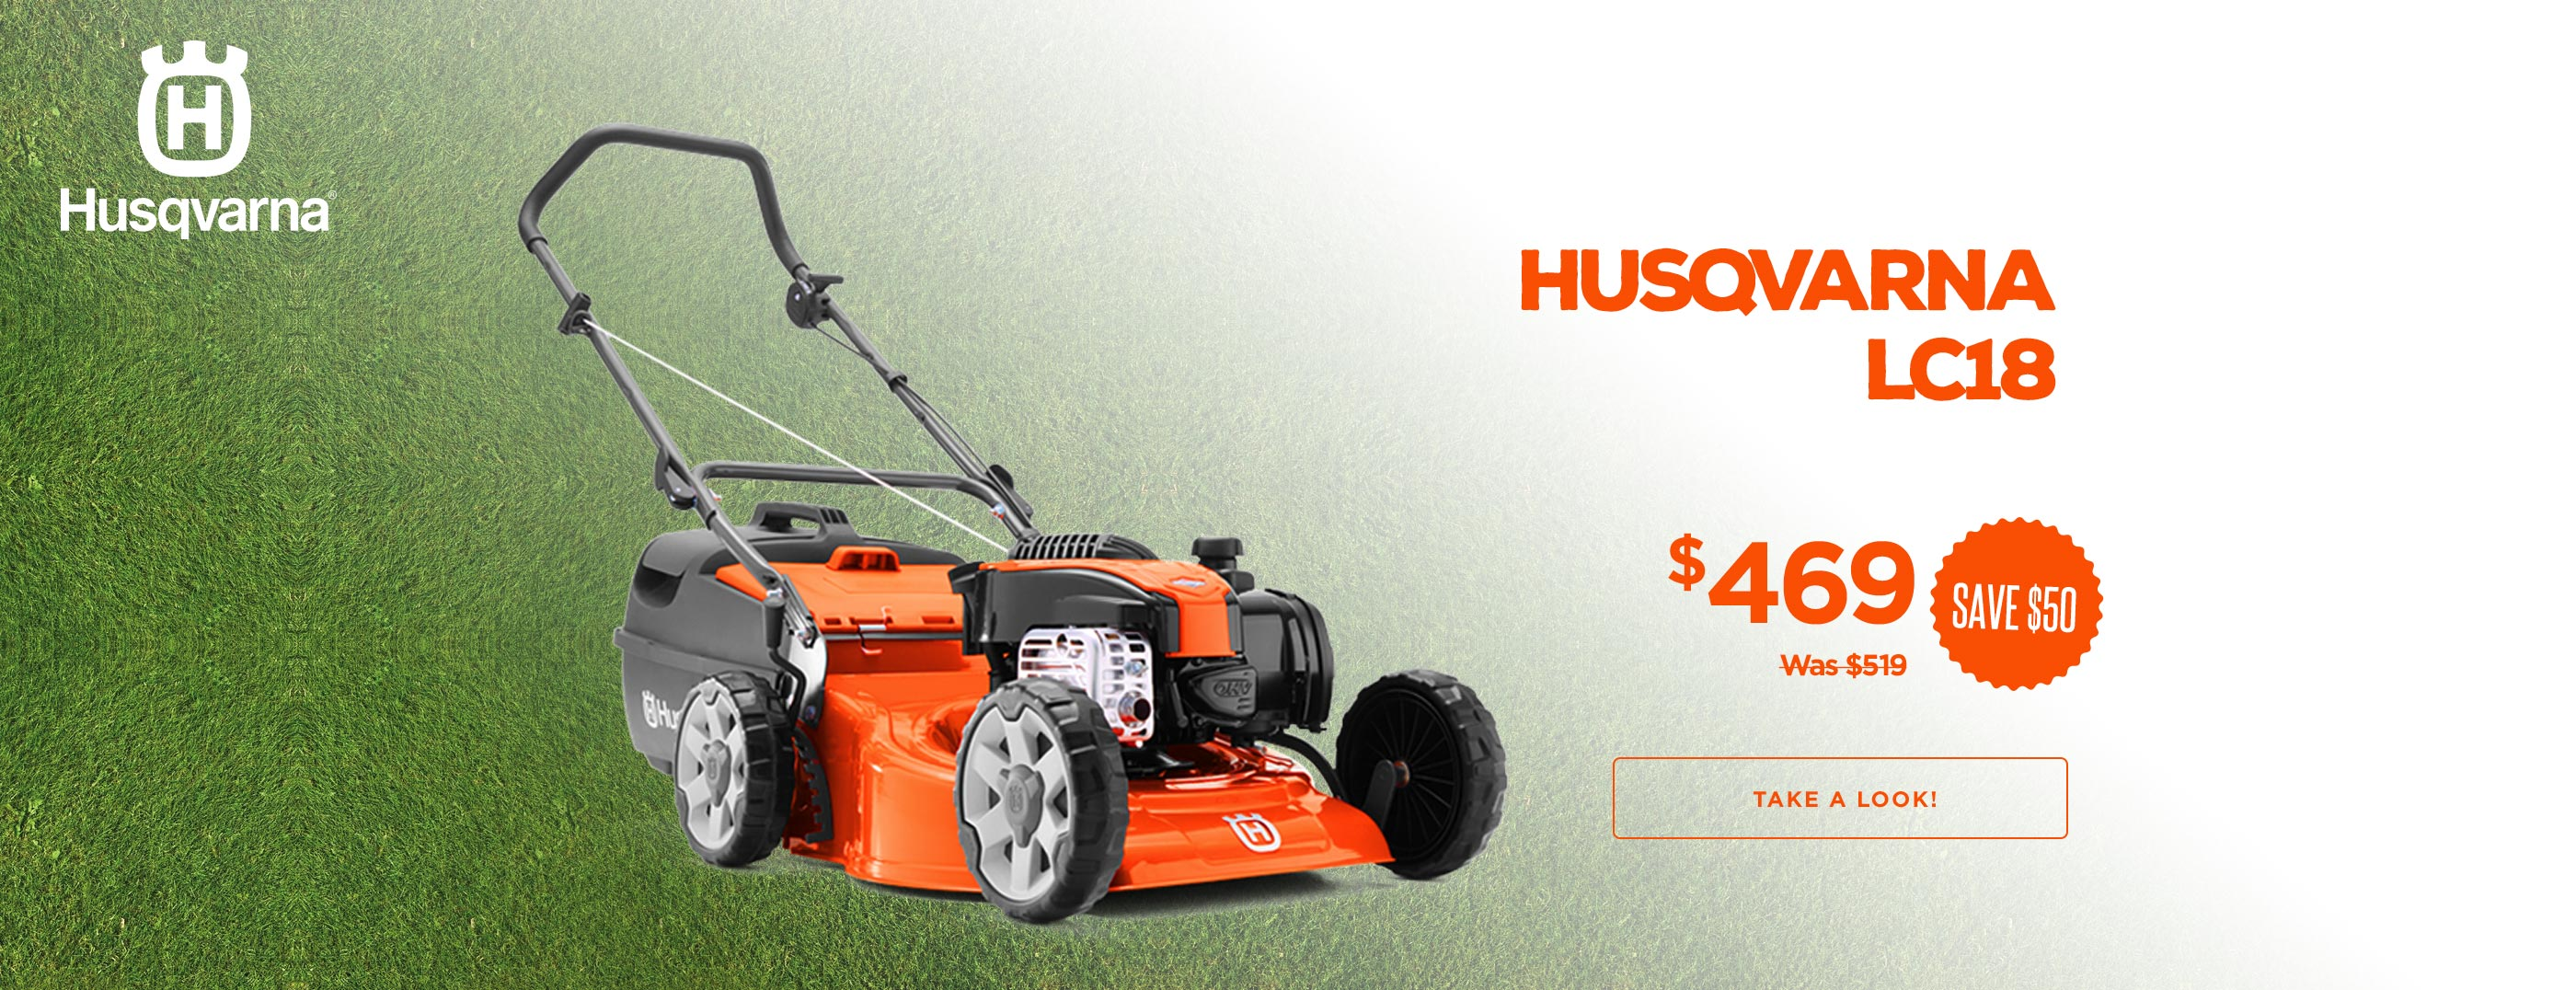 Husqvarna LC18 Lawn Mower Now $469